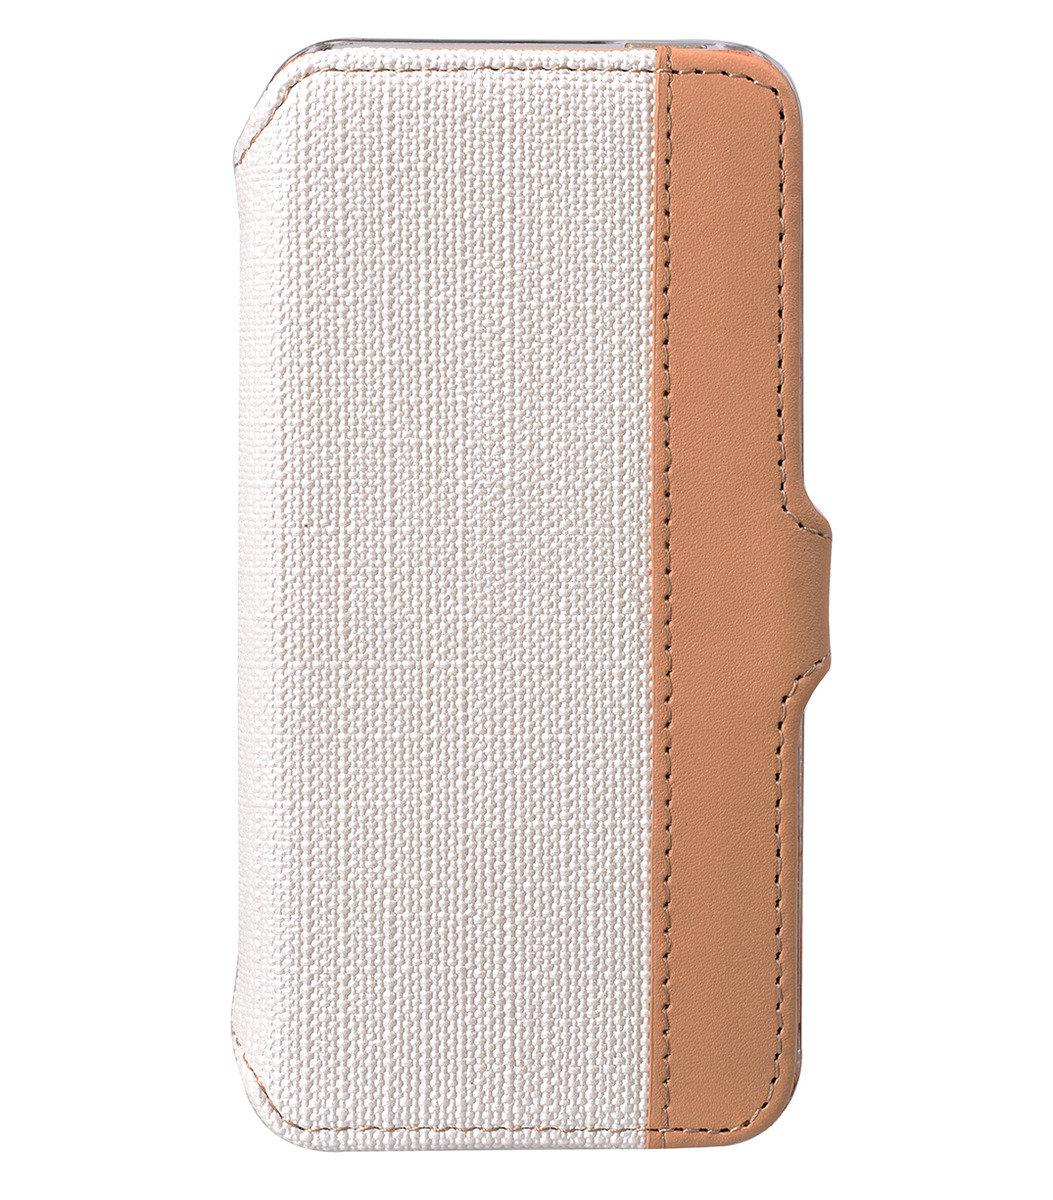 iPhone 5S/ 5 Sampu系列 橫揭式高級皮革手機套 - 白色